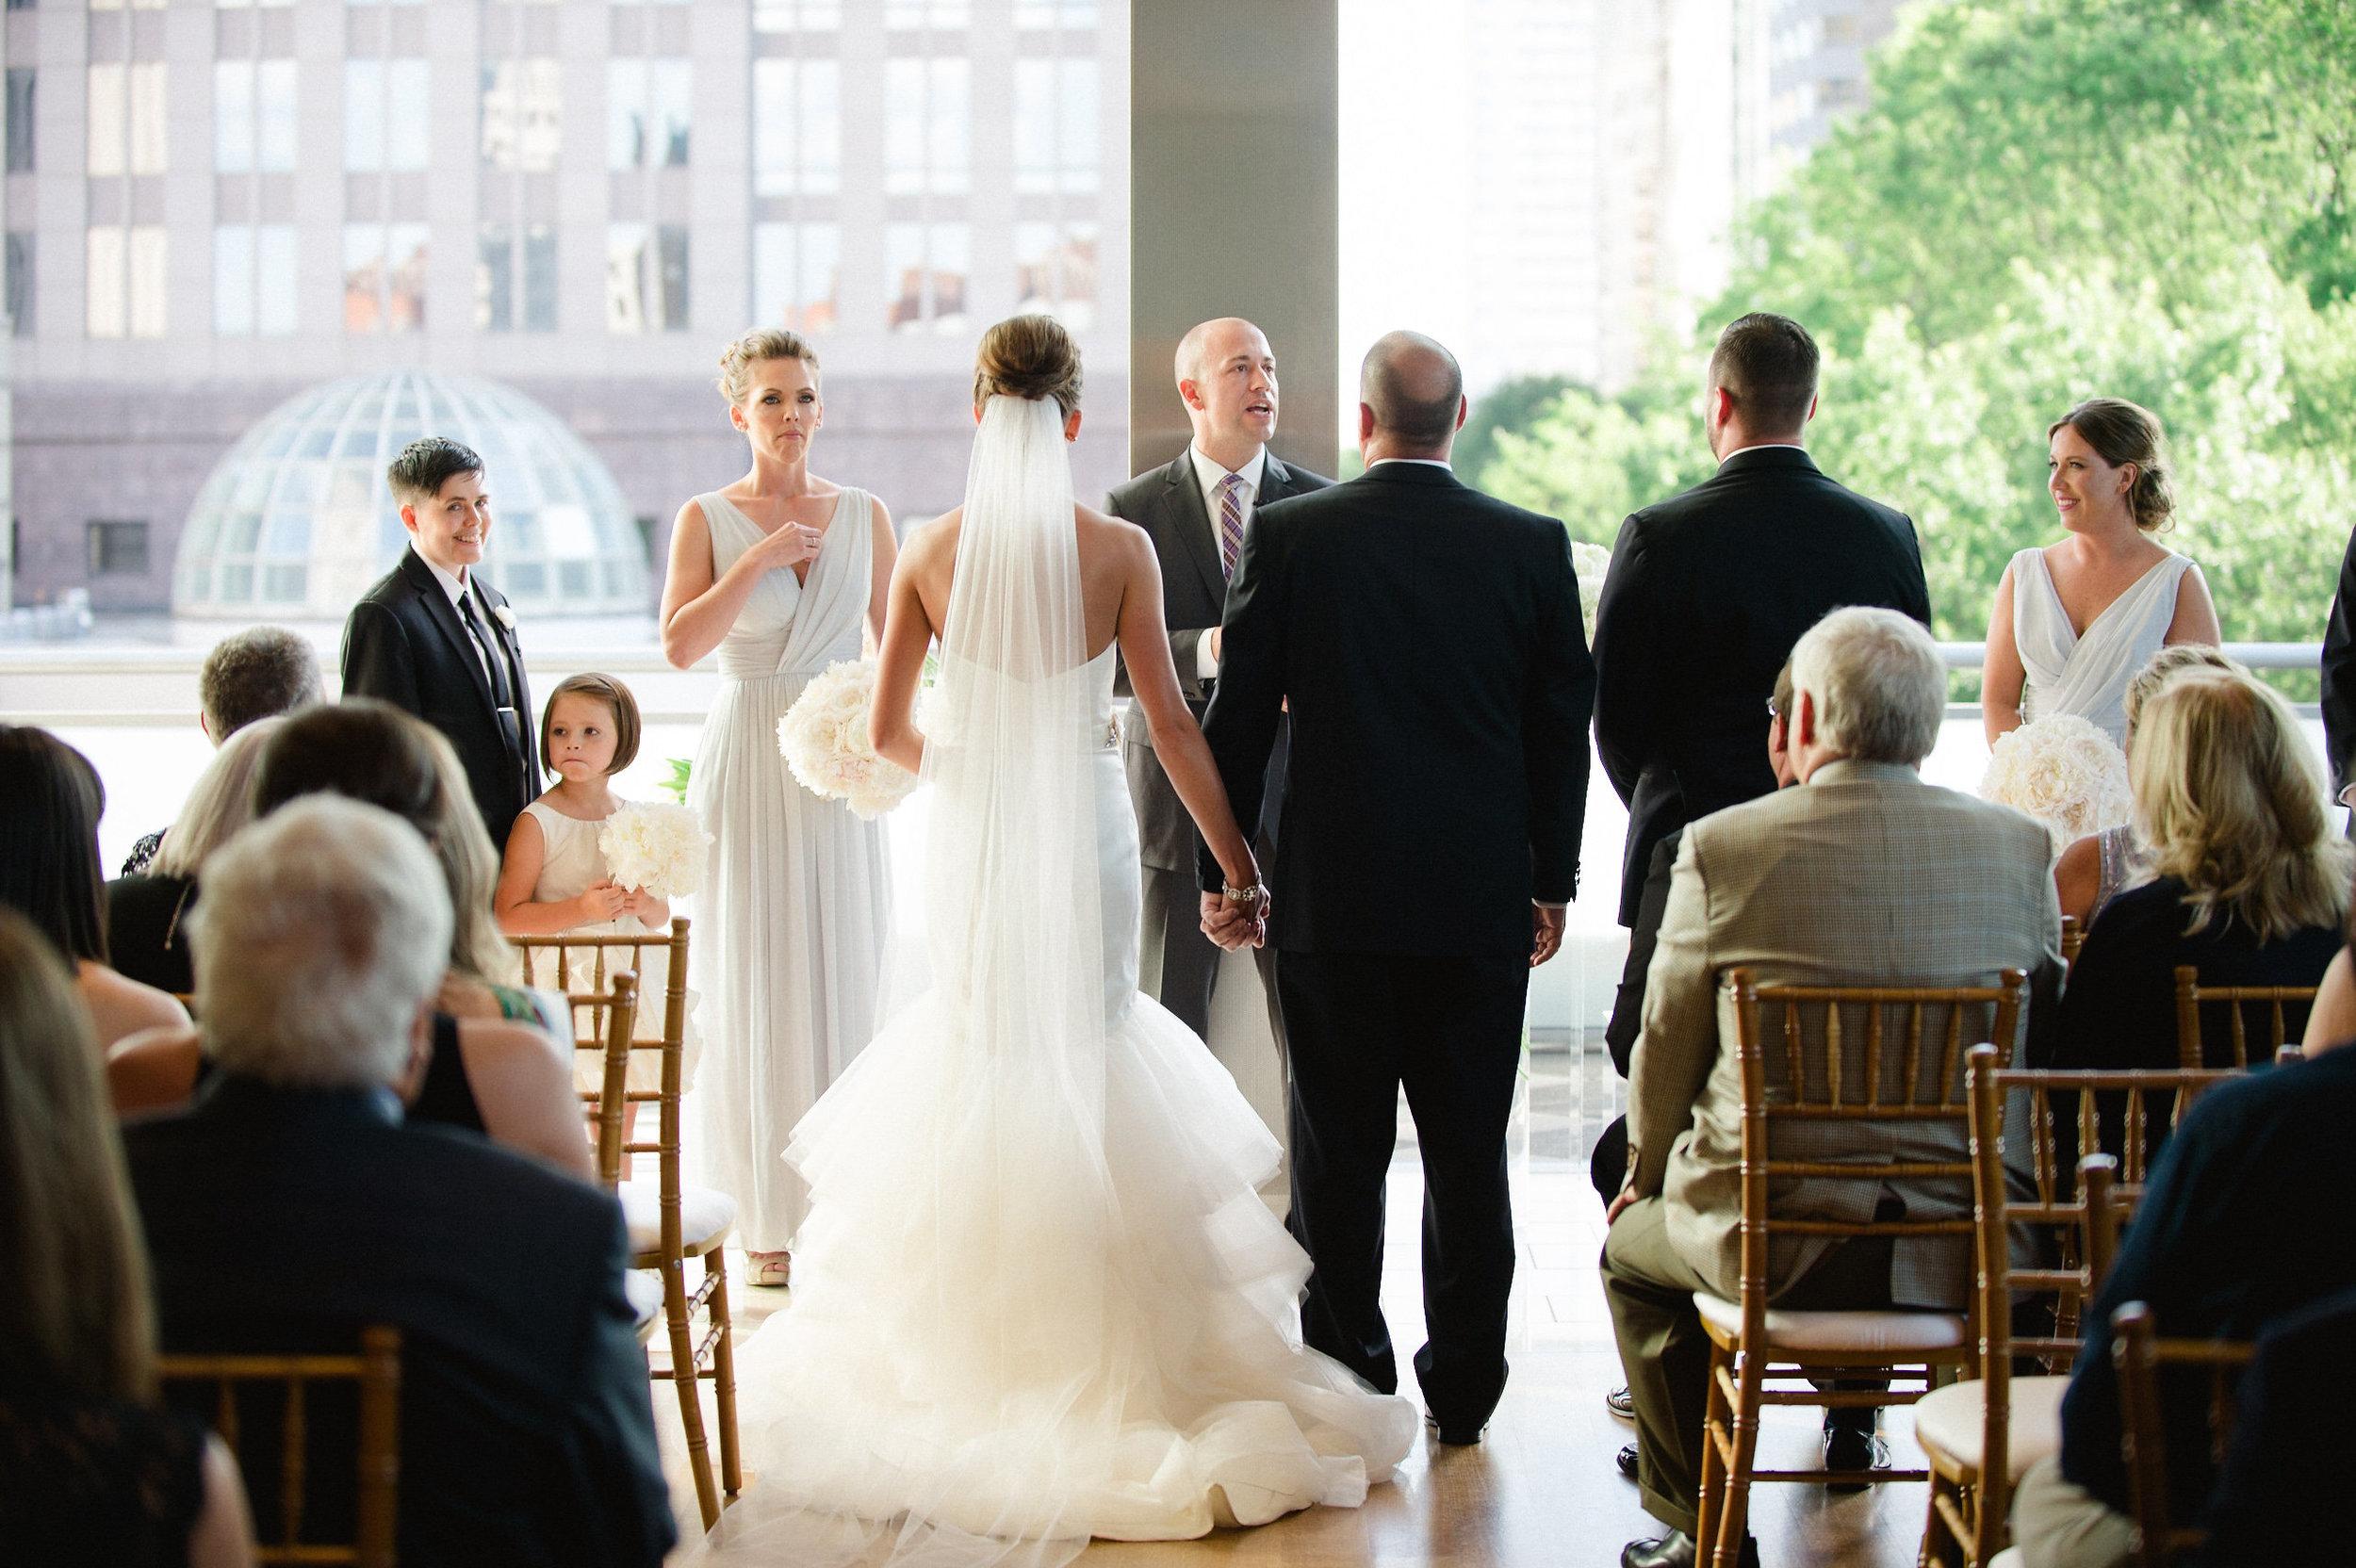 shelby&jordan|smitten&hooked|wedding|ceremony-062.jpg